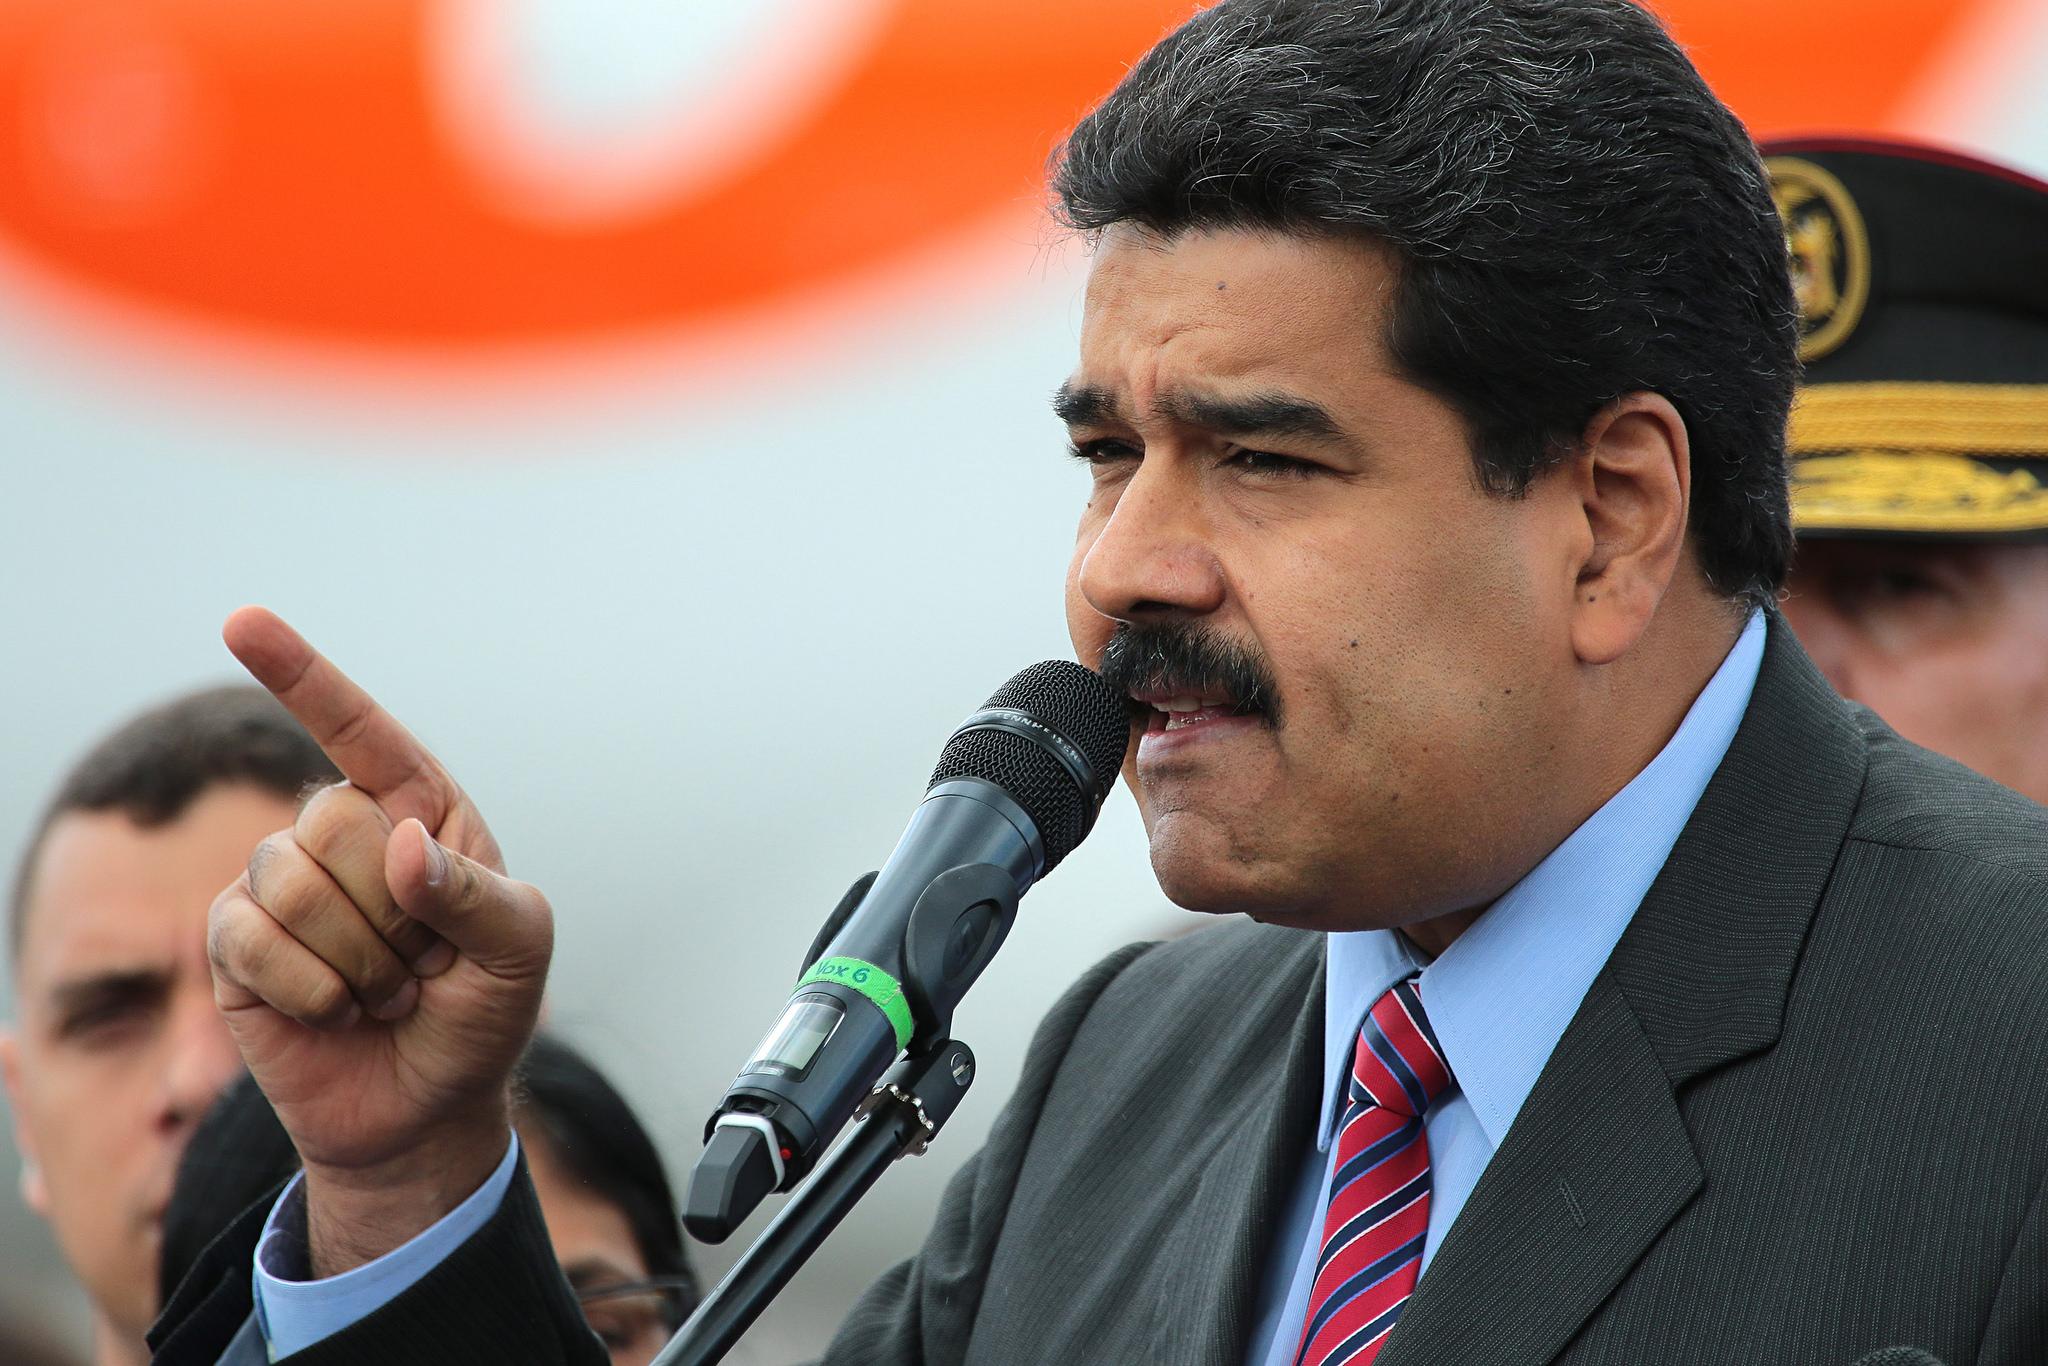 Venezuela's Never-Ending Crisis: Between Repression and Hope